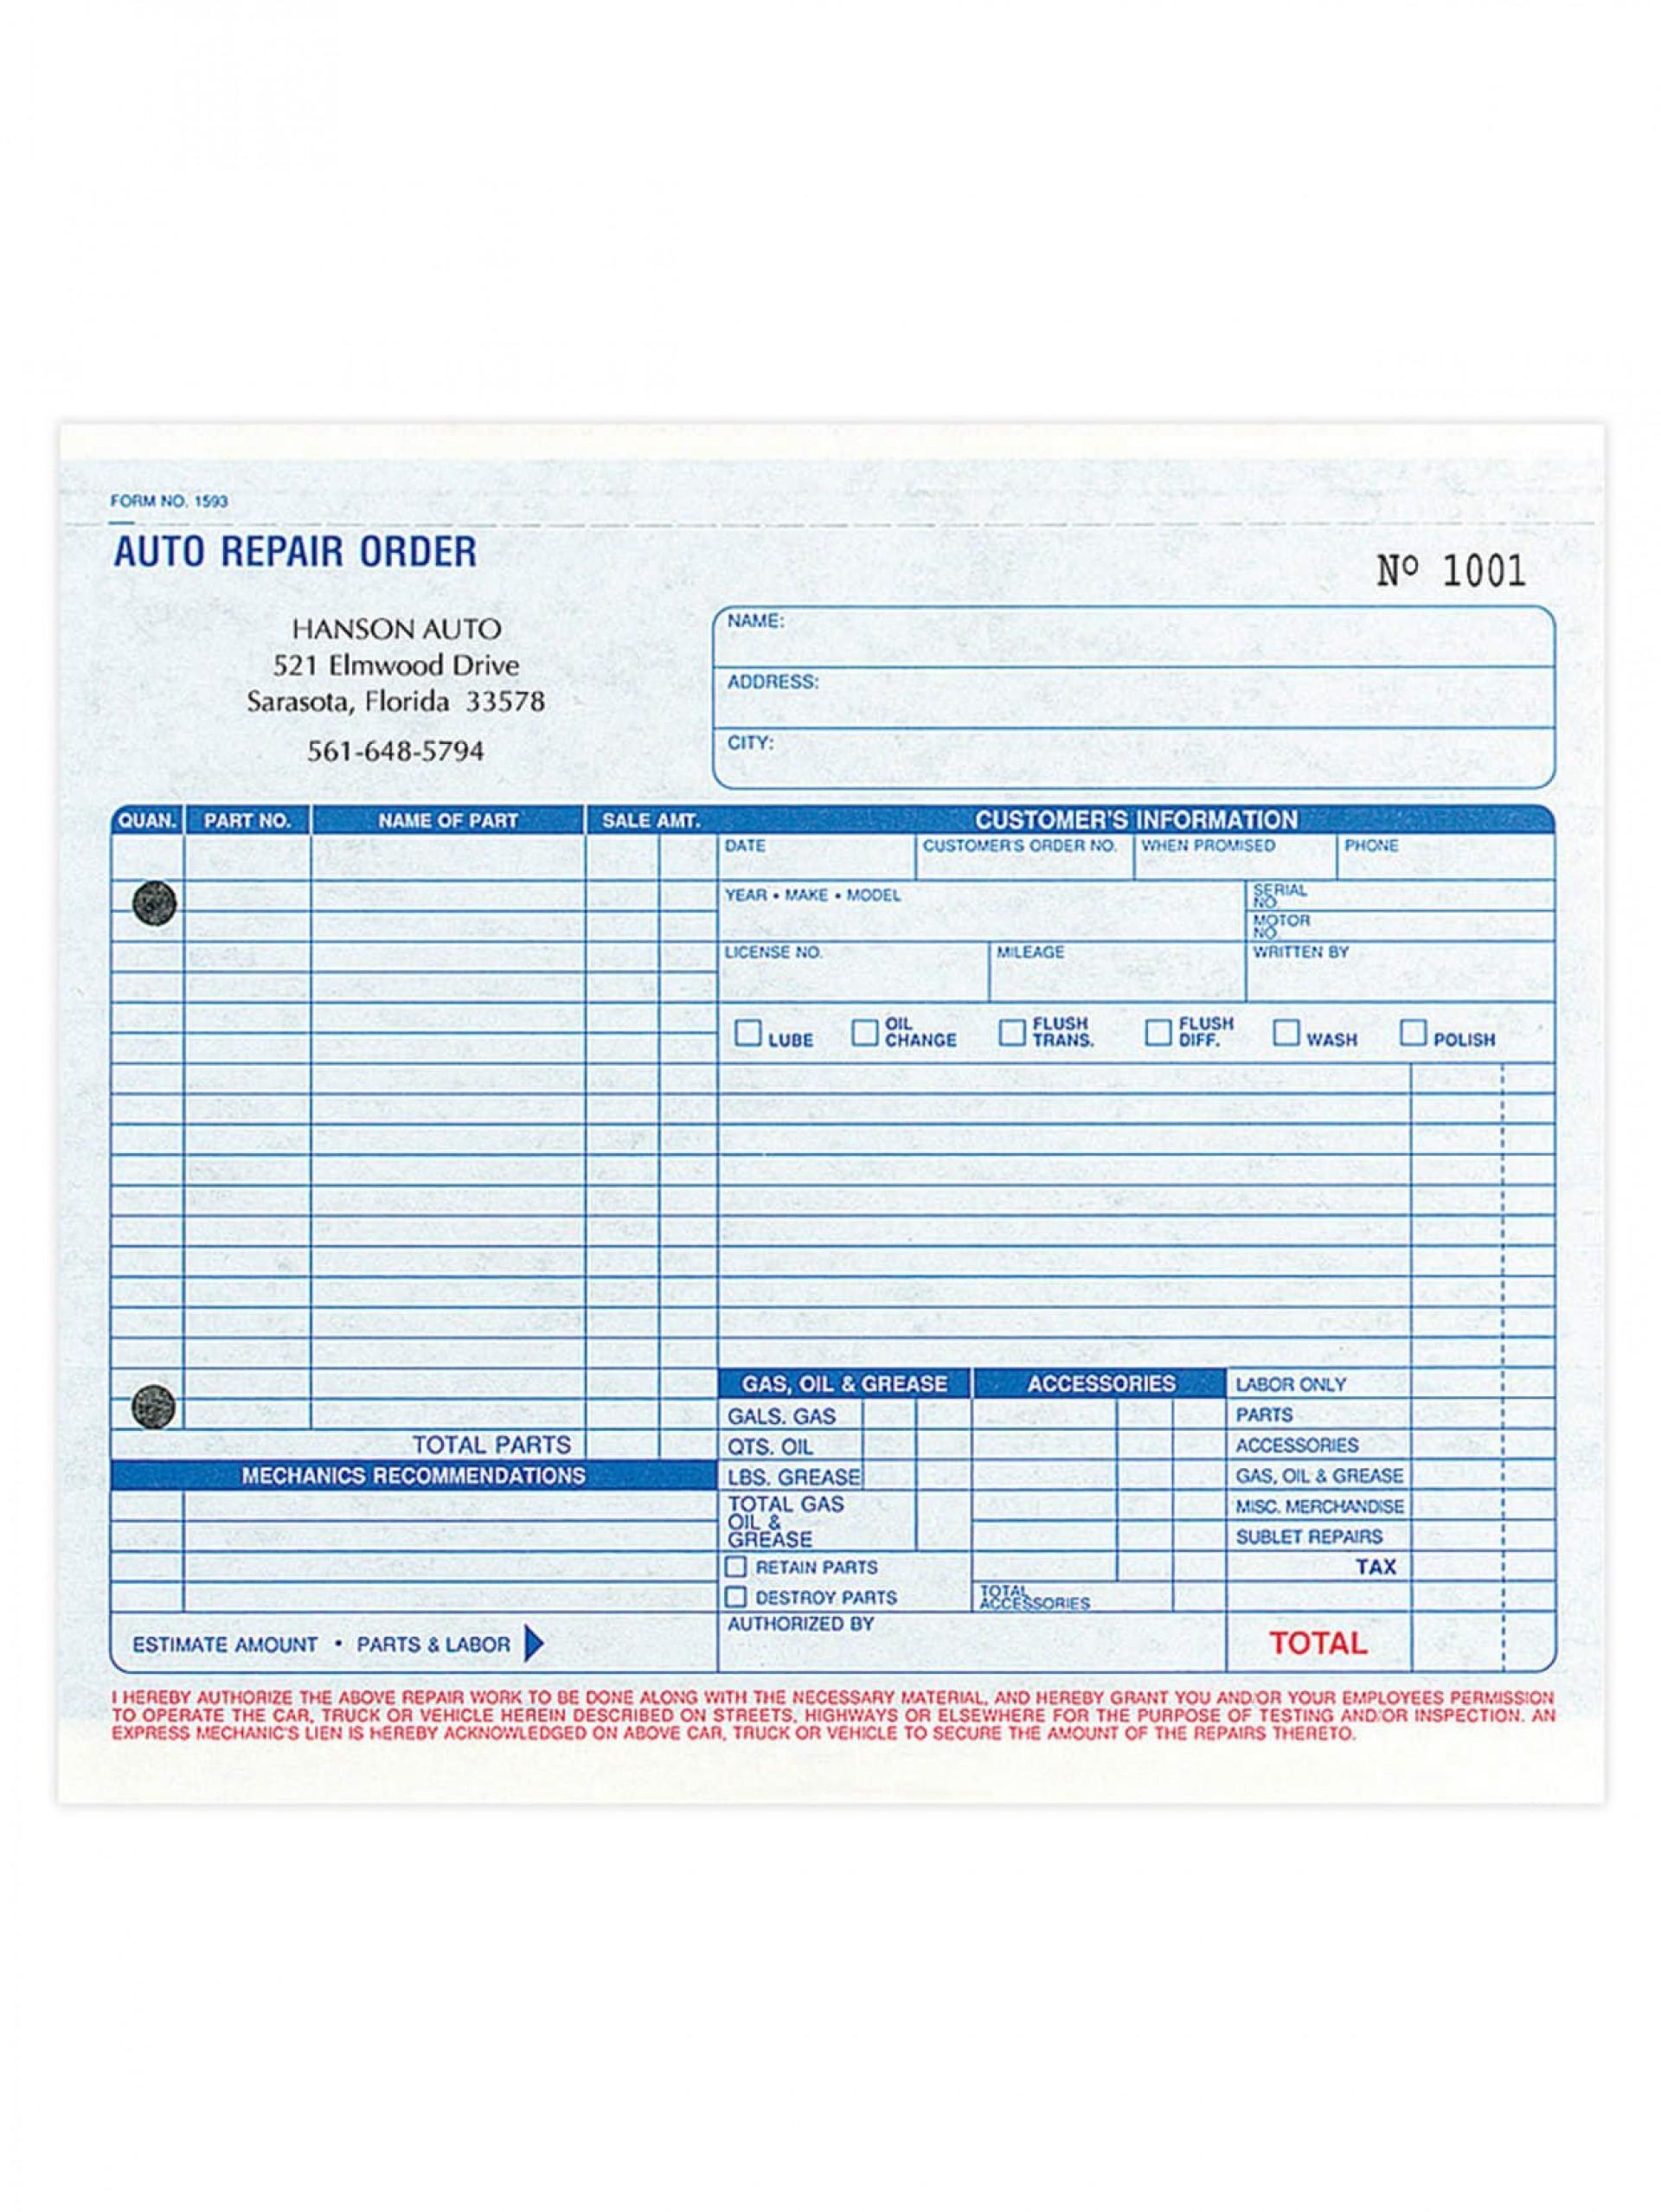 005 Singular Automotive Repair Estimate Template High Definition  Auto Free Download Car Form1920